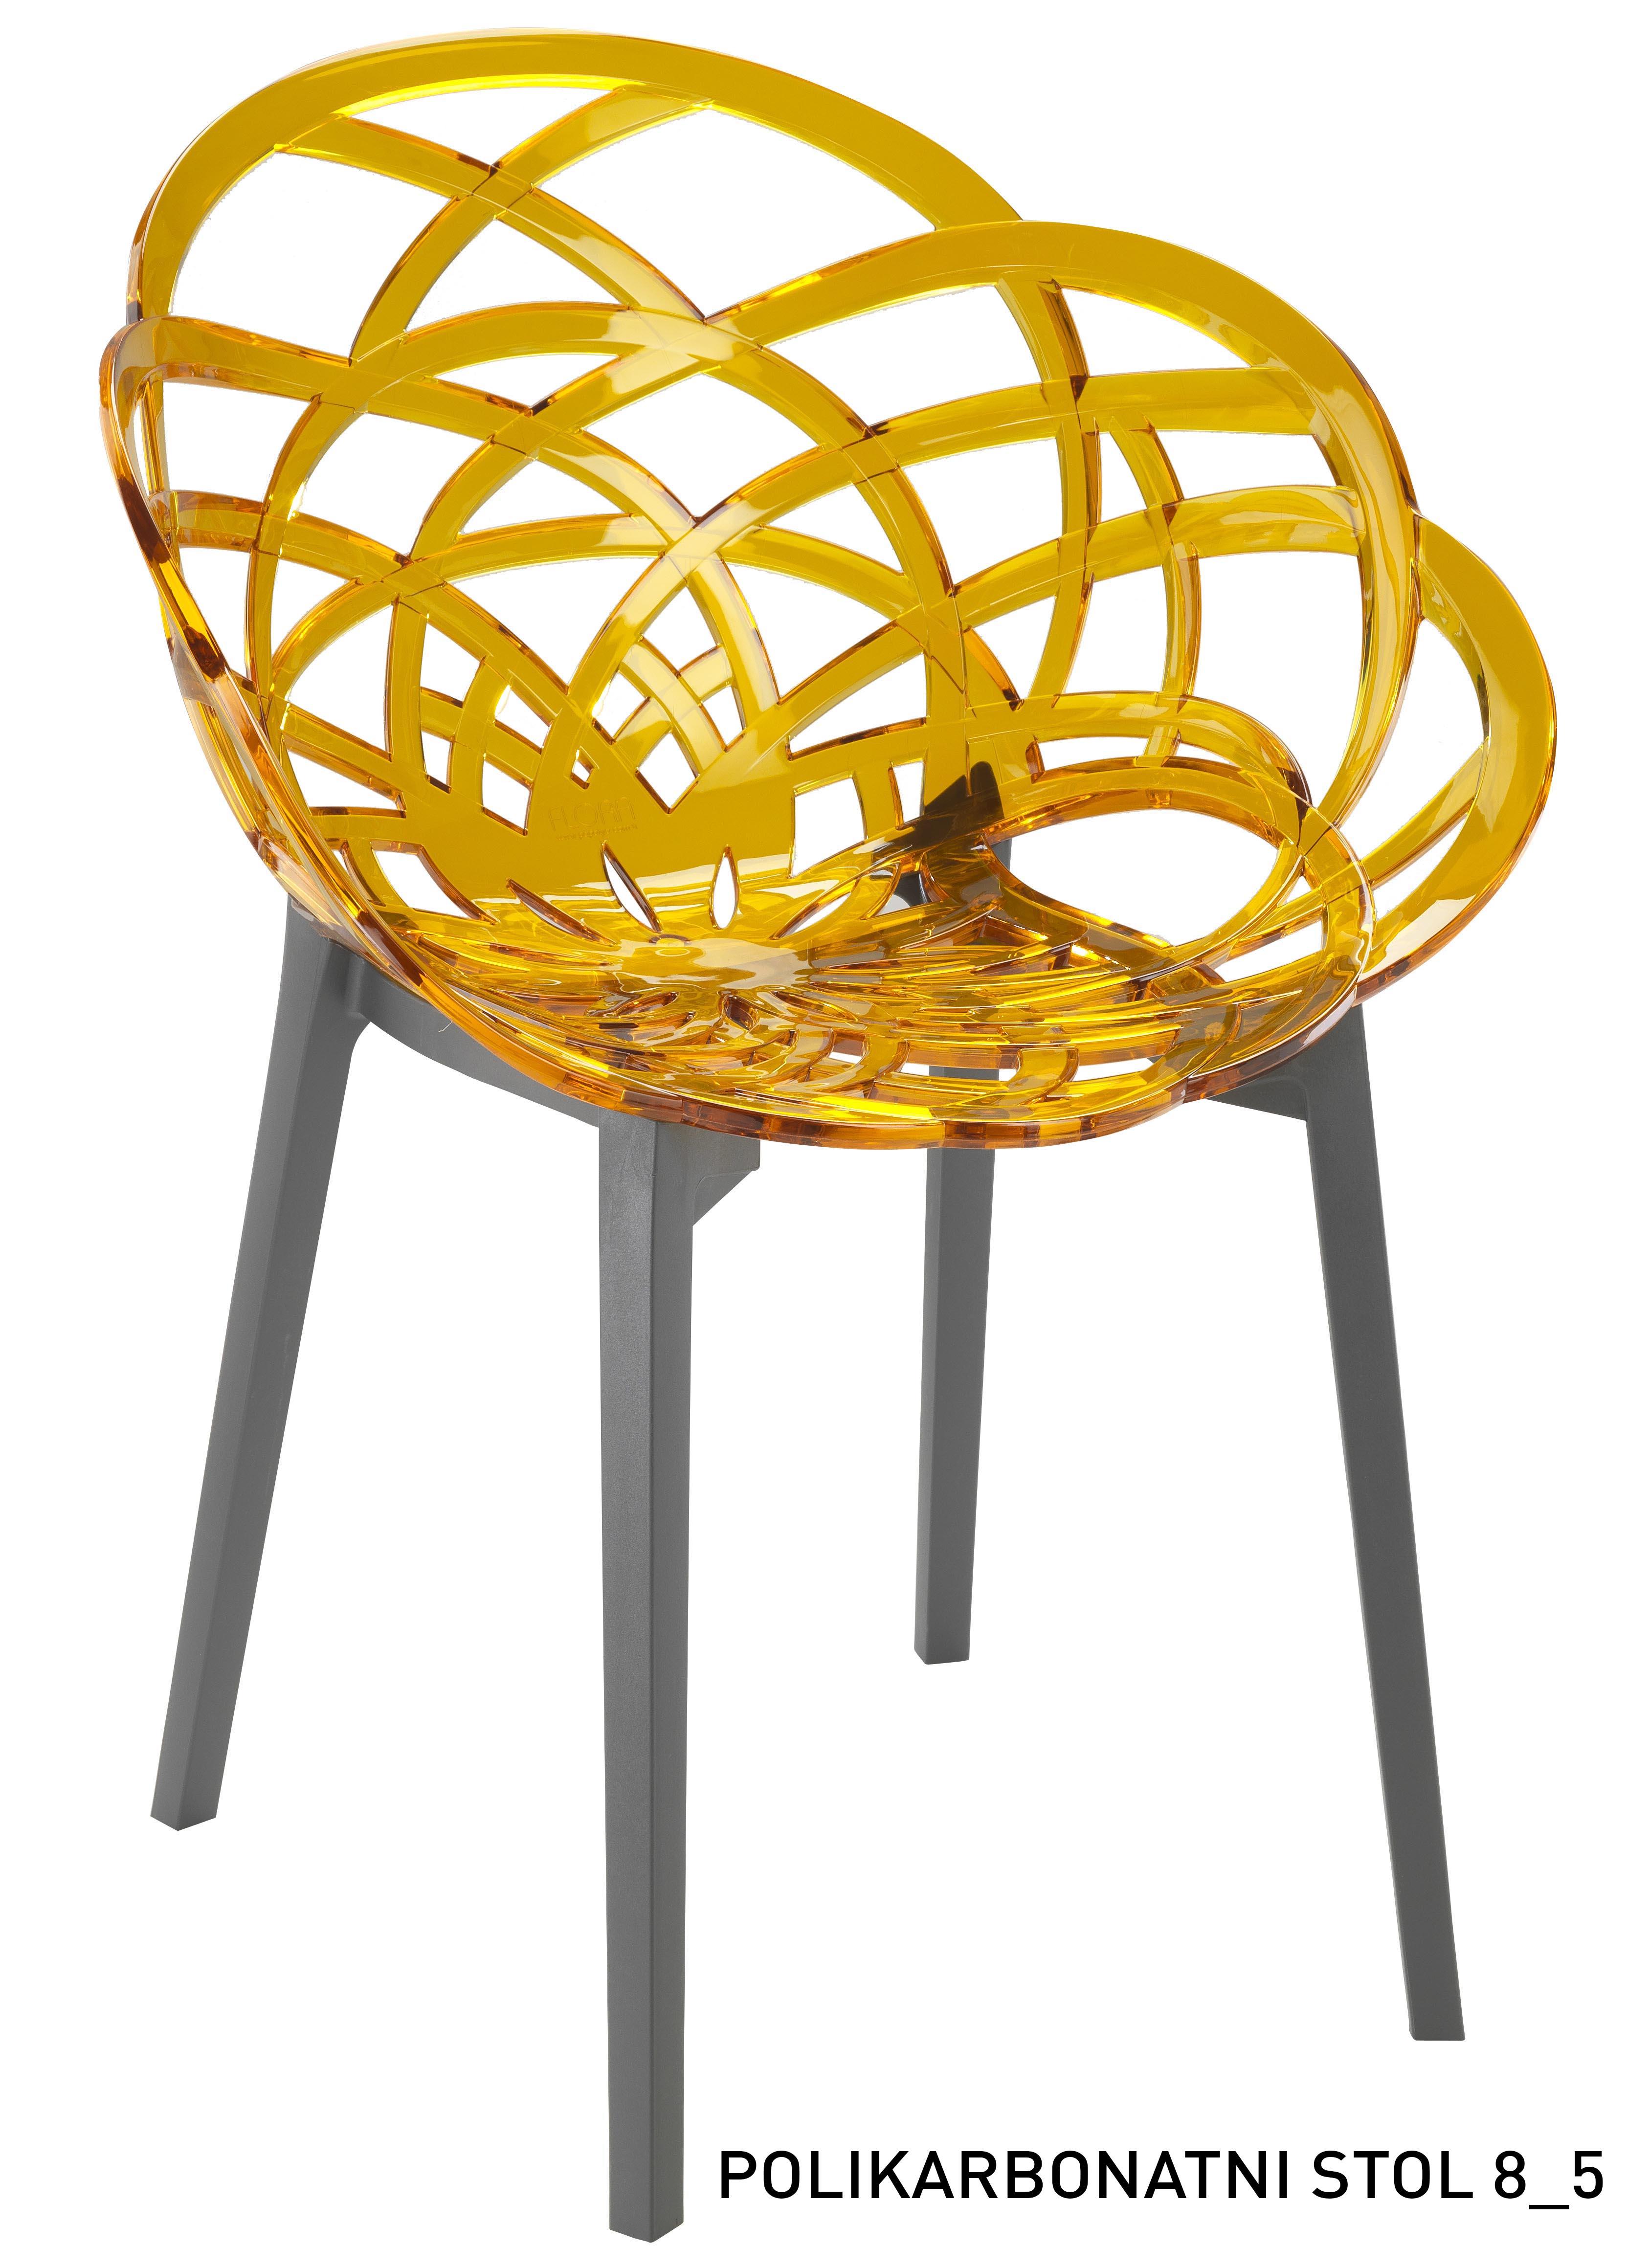 Lido_Polikarbonatni stoli 8_5